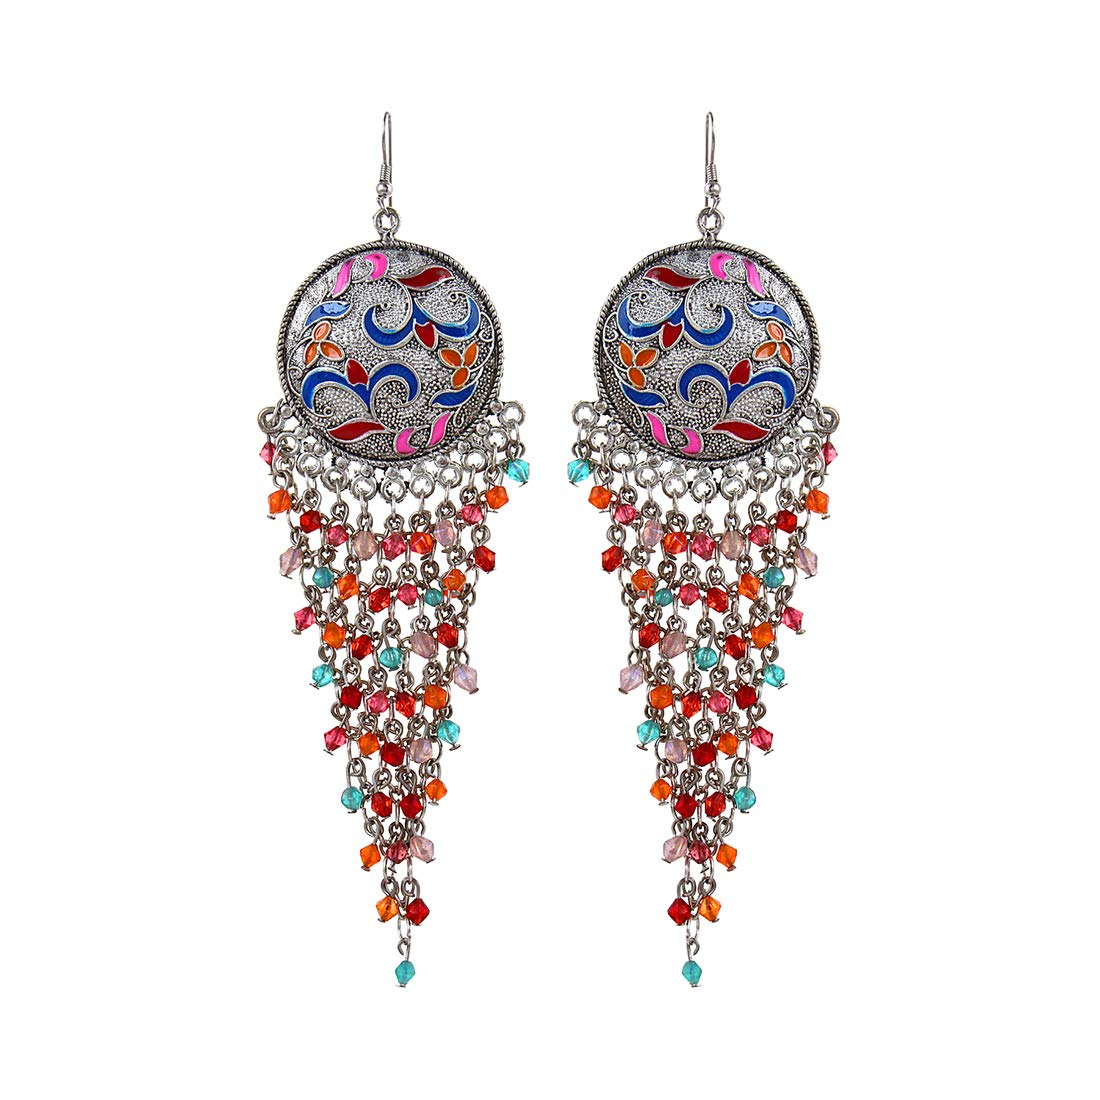 Saissa Oxidised Tassel Indian Earrings Jewelry for Girls and Women